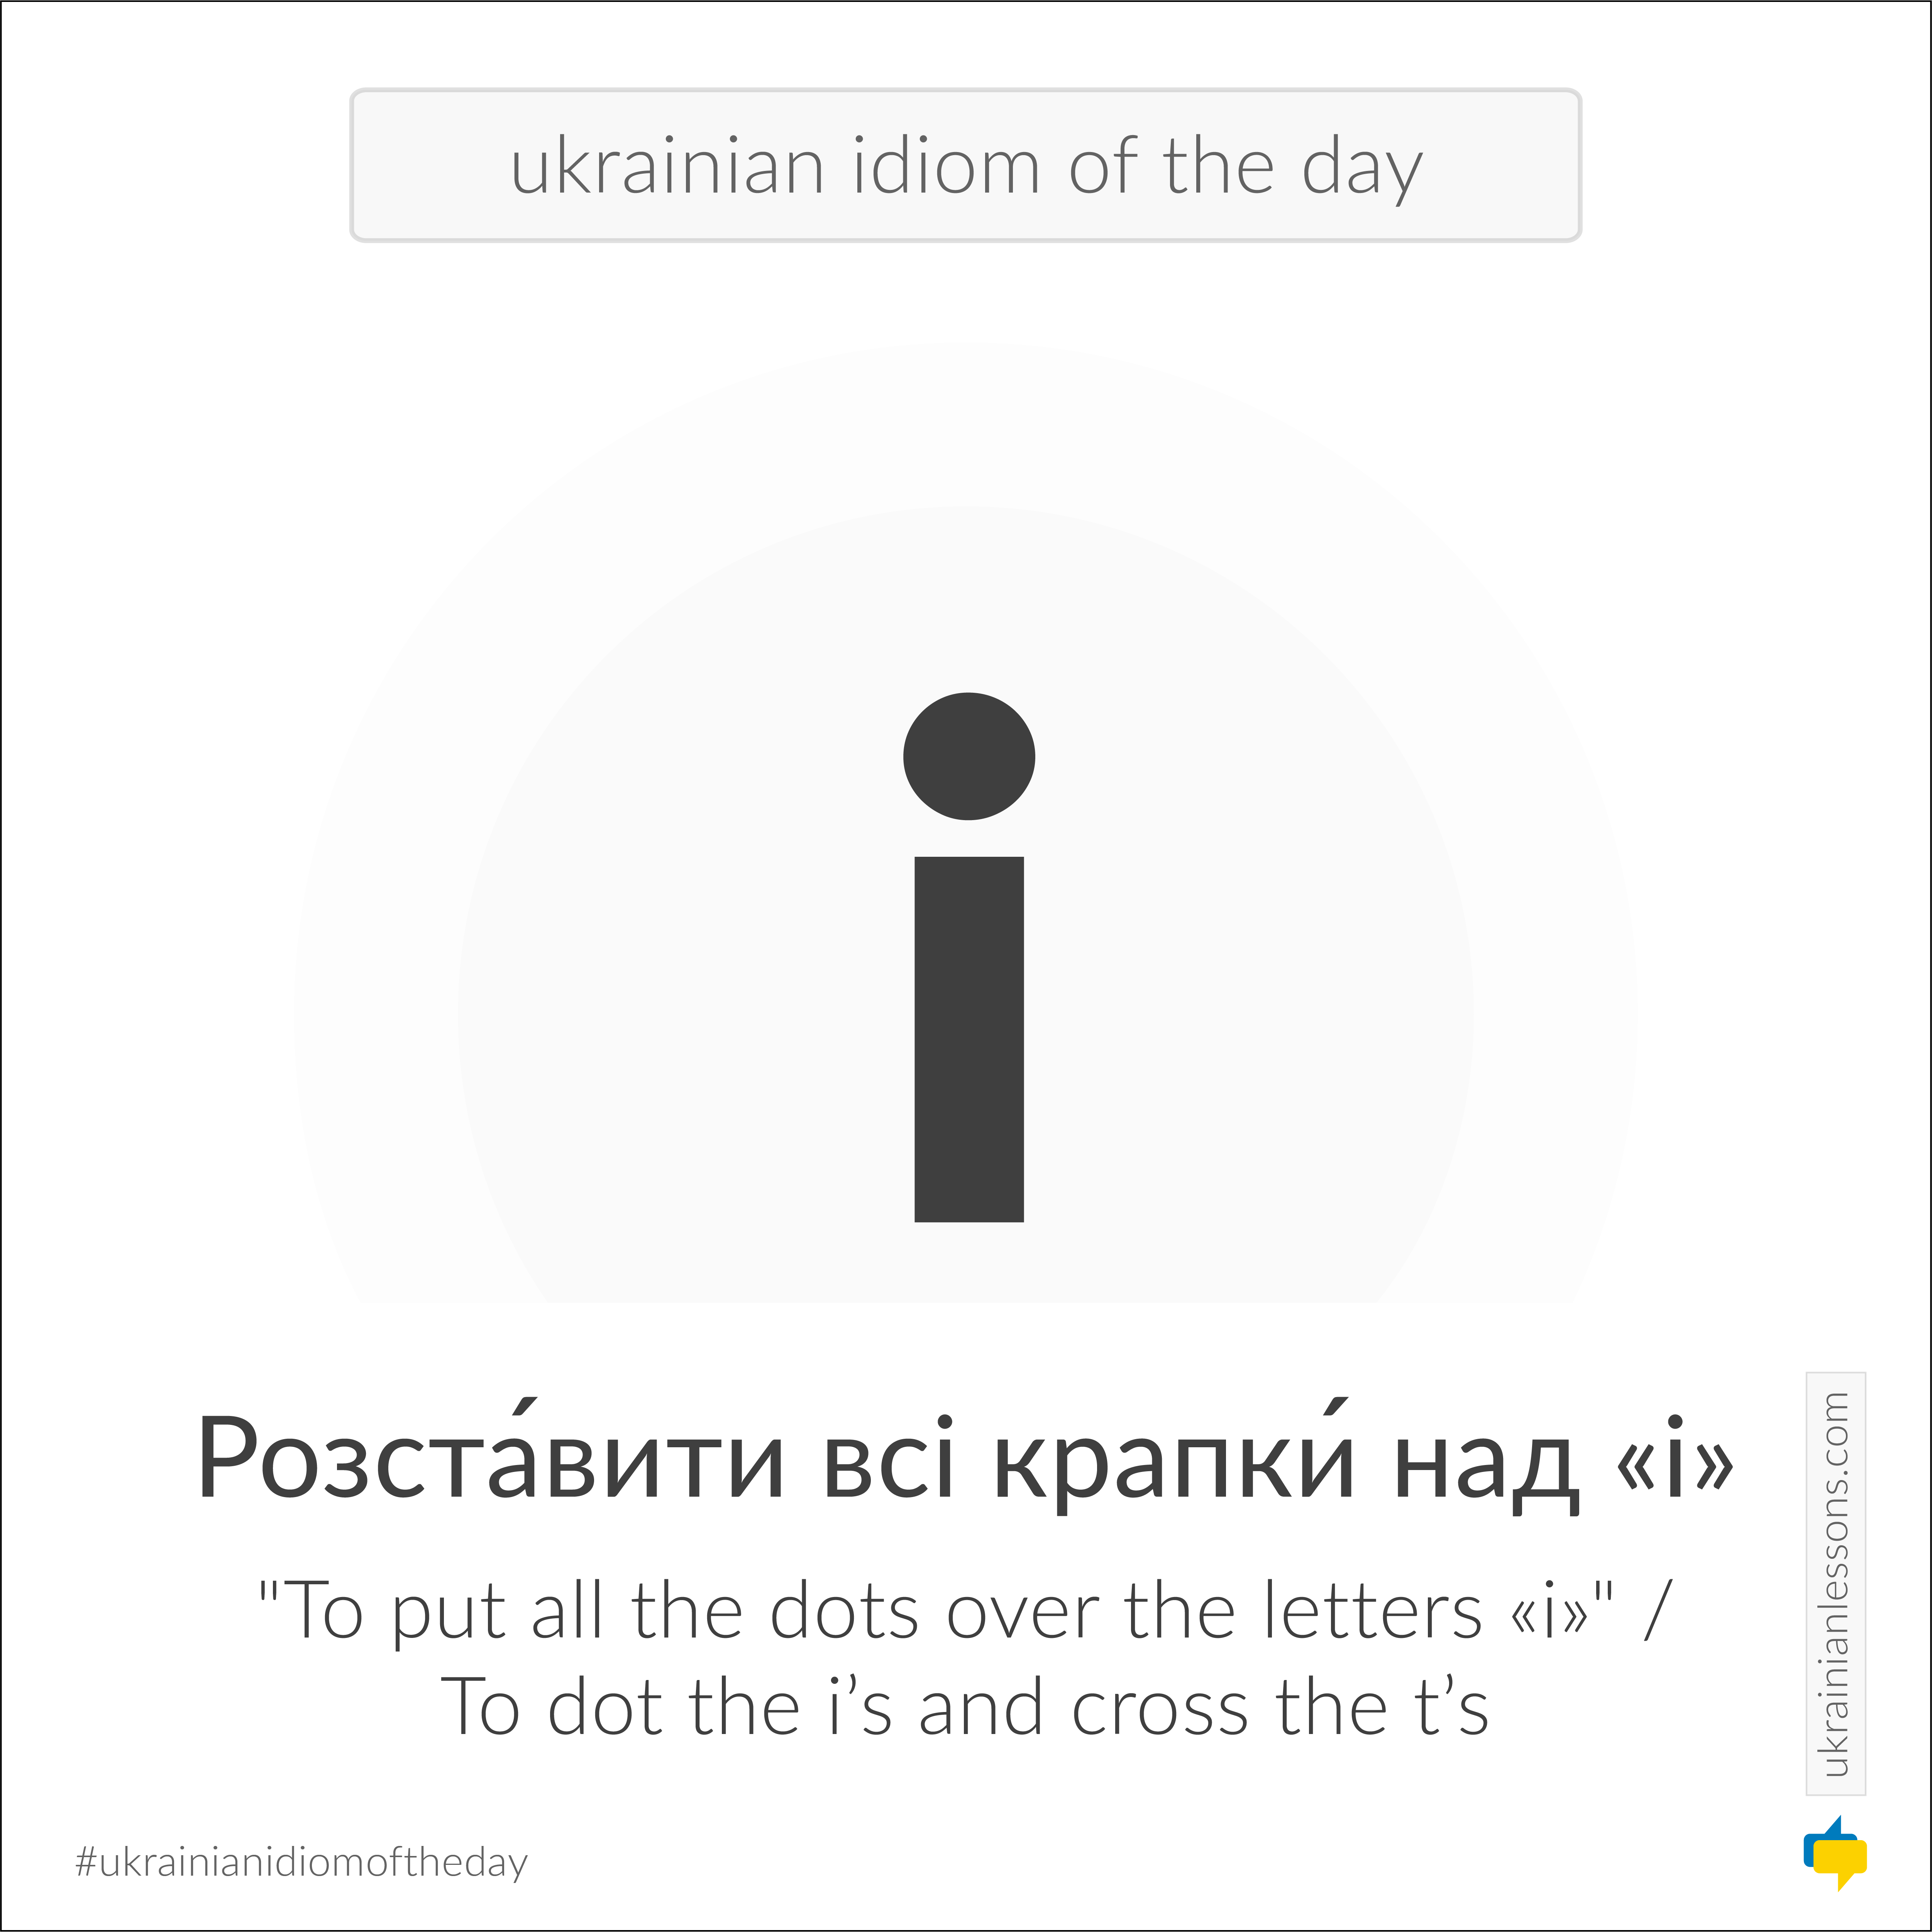 Ukrainian idsoms